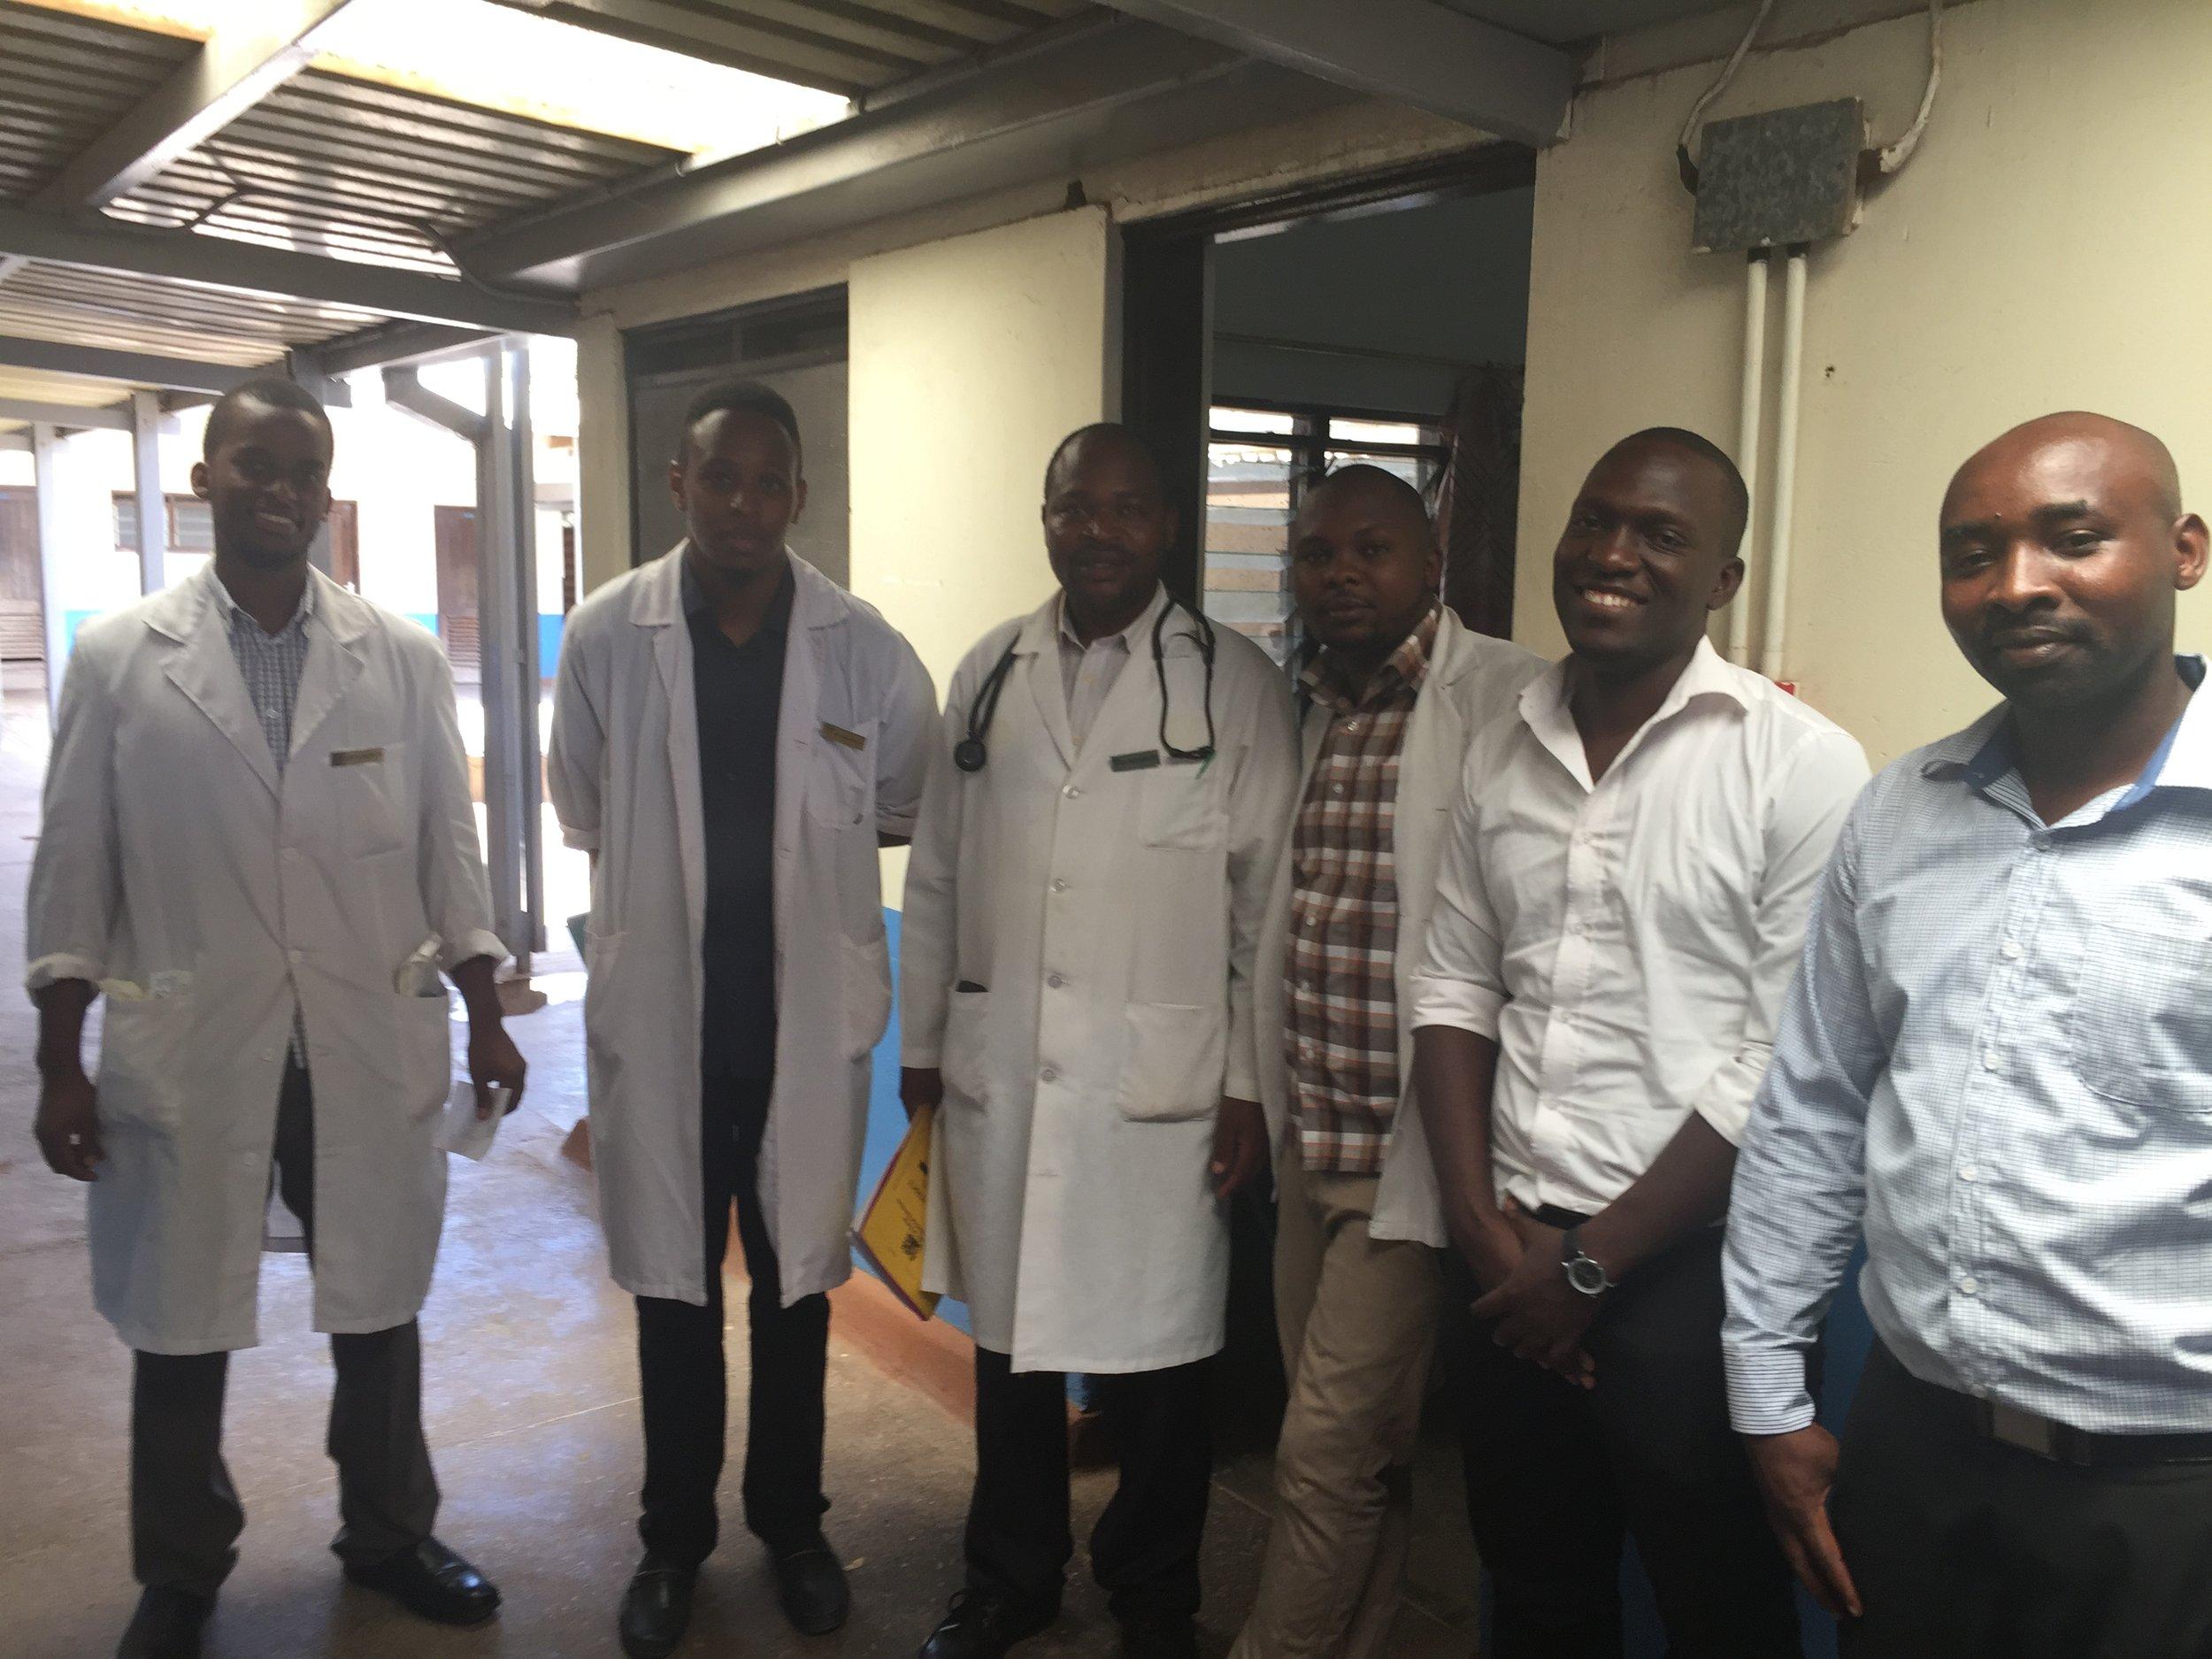 Dr. Mark Muriithi, Dr. Magara Marvin, Dr. Kimru Kimathi G, Hagai,